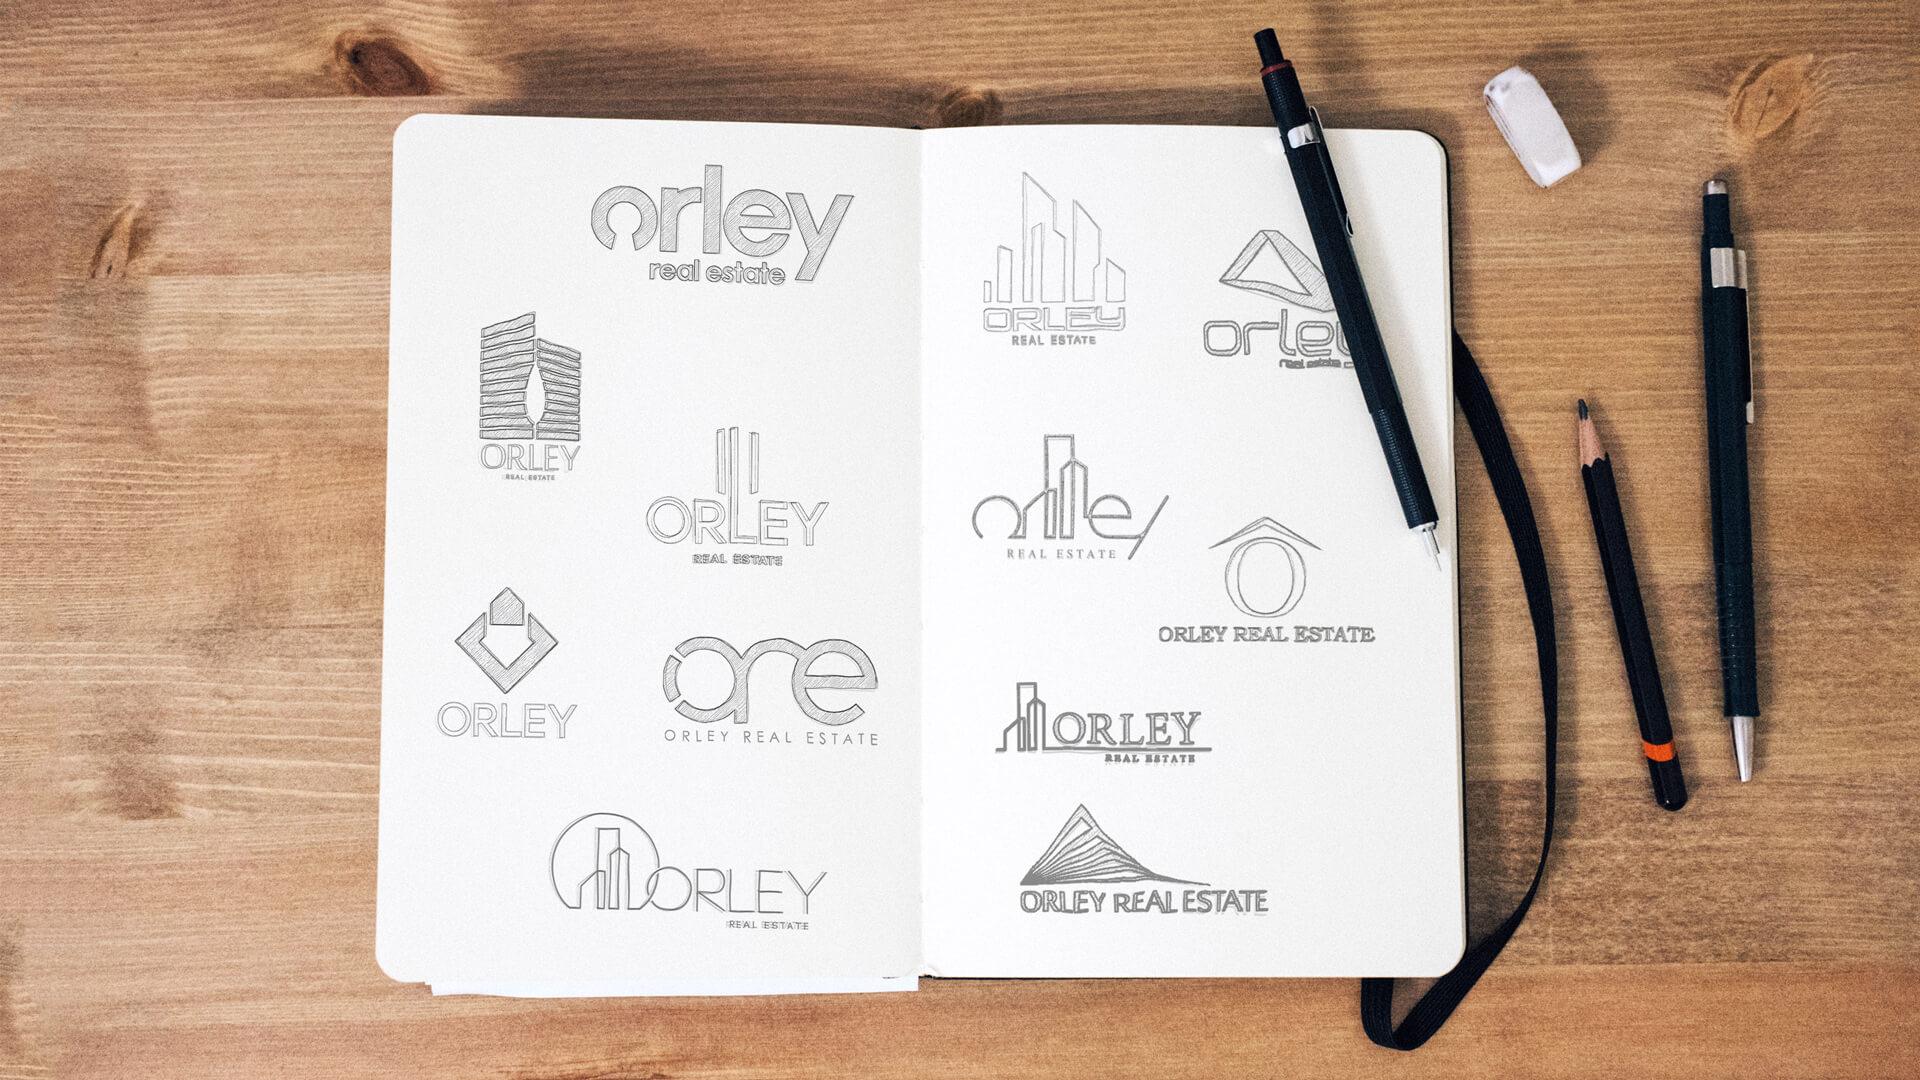 Orley Real Estate Branding Ideas